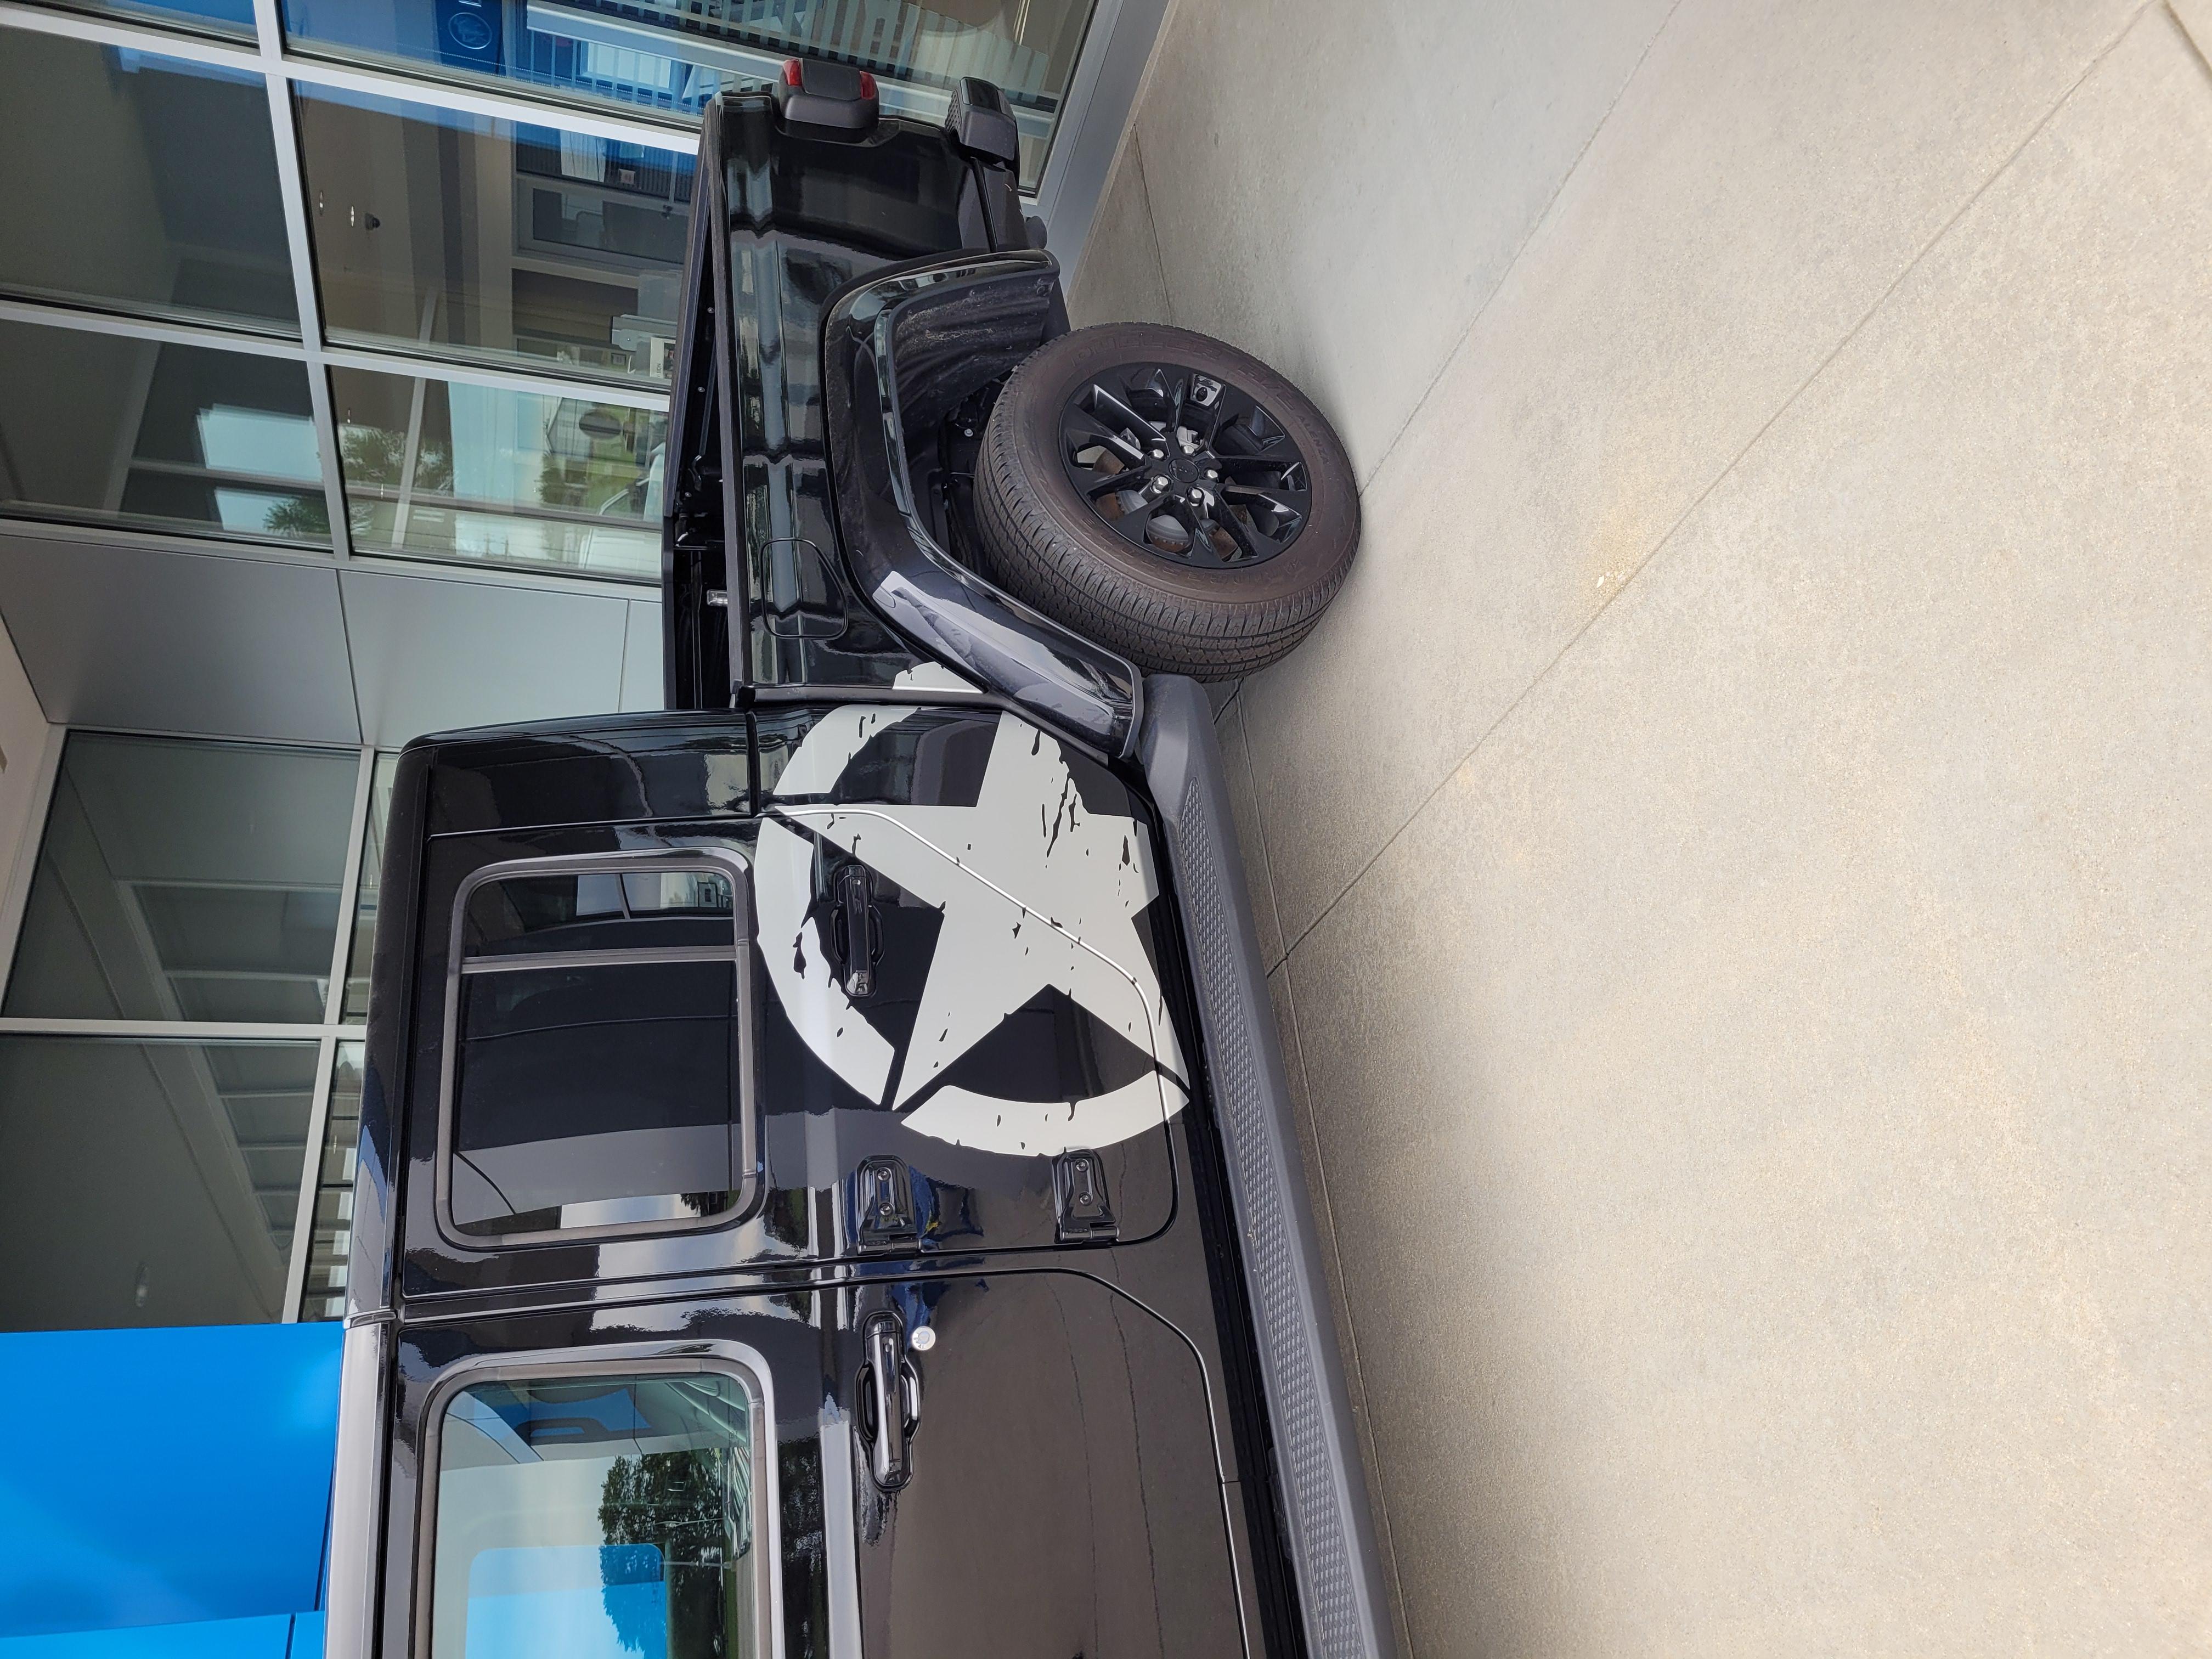 2020-2021 Jeep Gladiator Side Decals Package LEGEND SIDE KIT